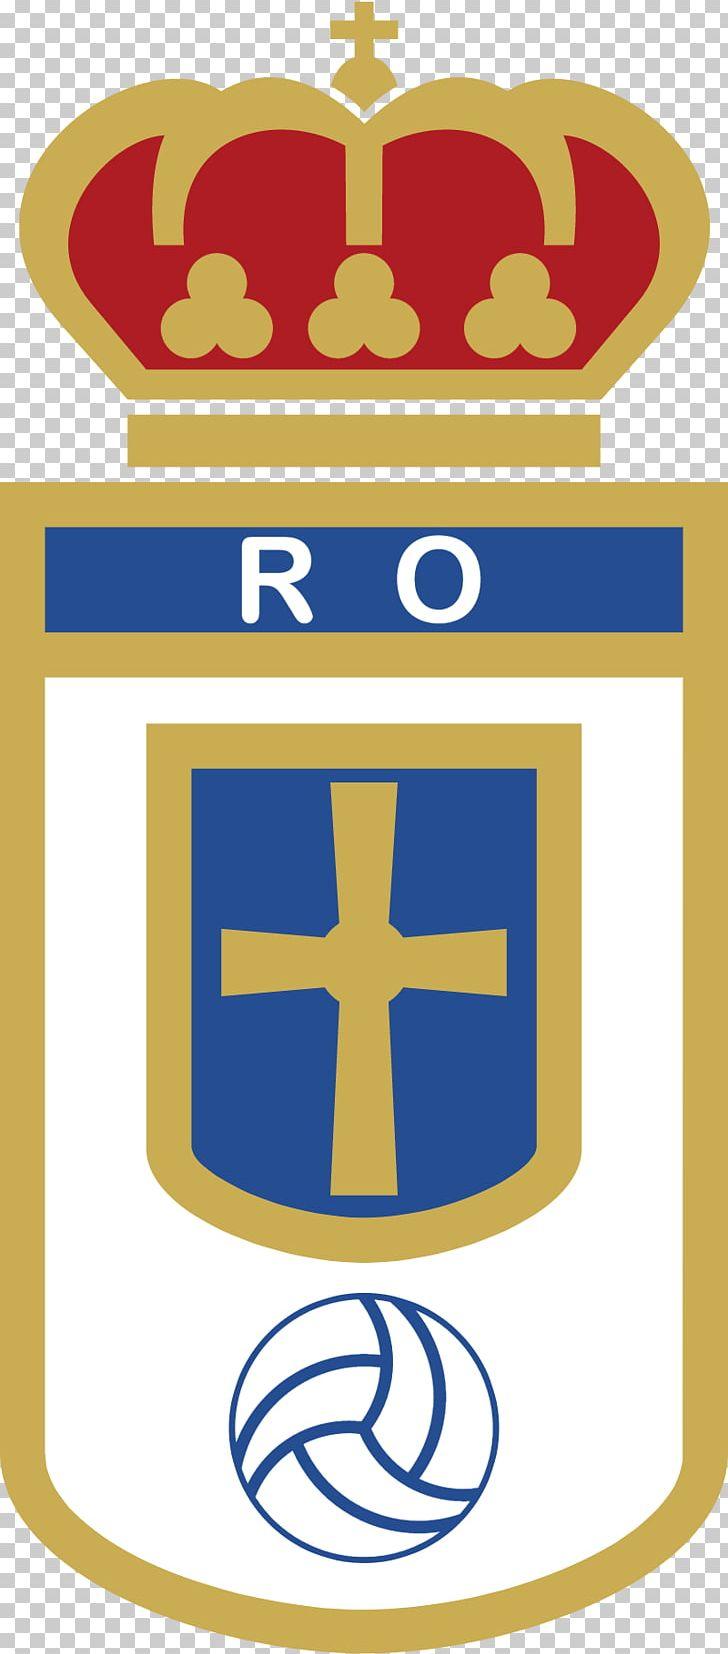 Real Oviedo Football Adobe Illustrator Artwork Portable Network Graphics PNG, Clipart, Area, Arrow Electronics Logo, Artwork, Asturias, Brand Free PNG Download